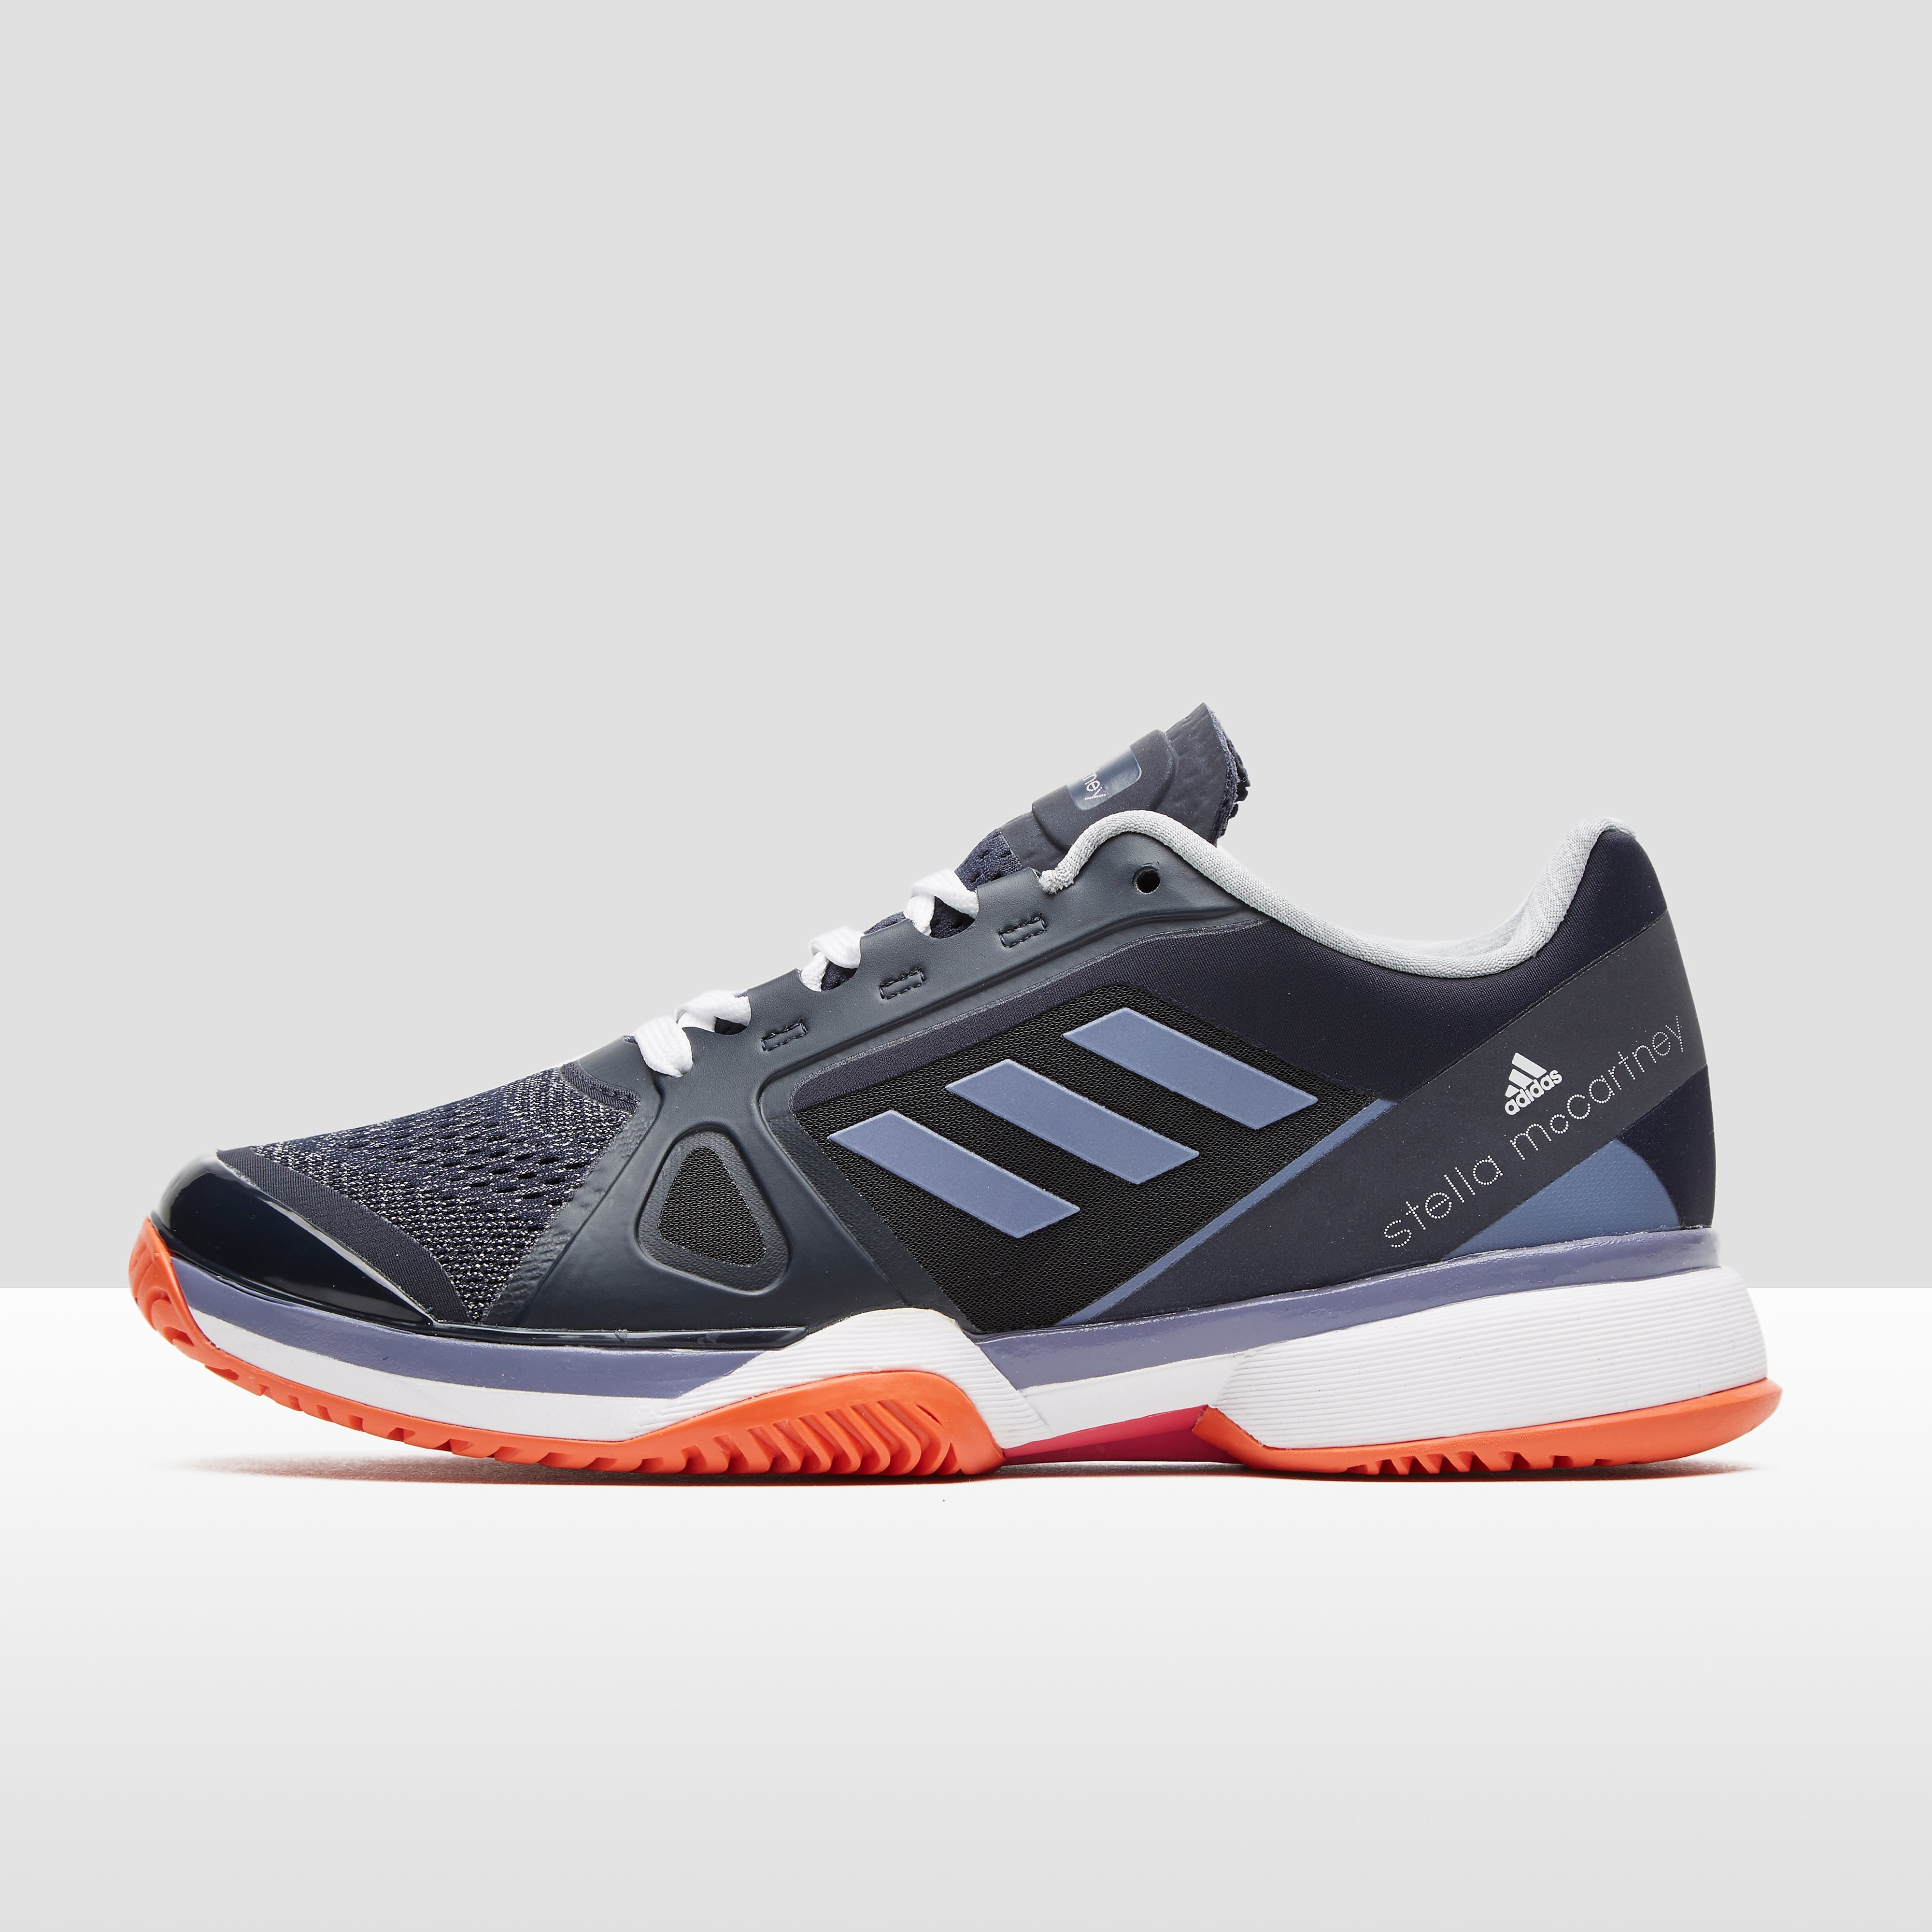 adidas Stella McCartney Barricade 2017 Women's Tennis Shoes